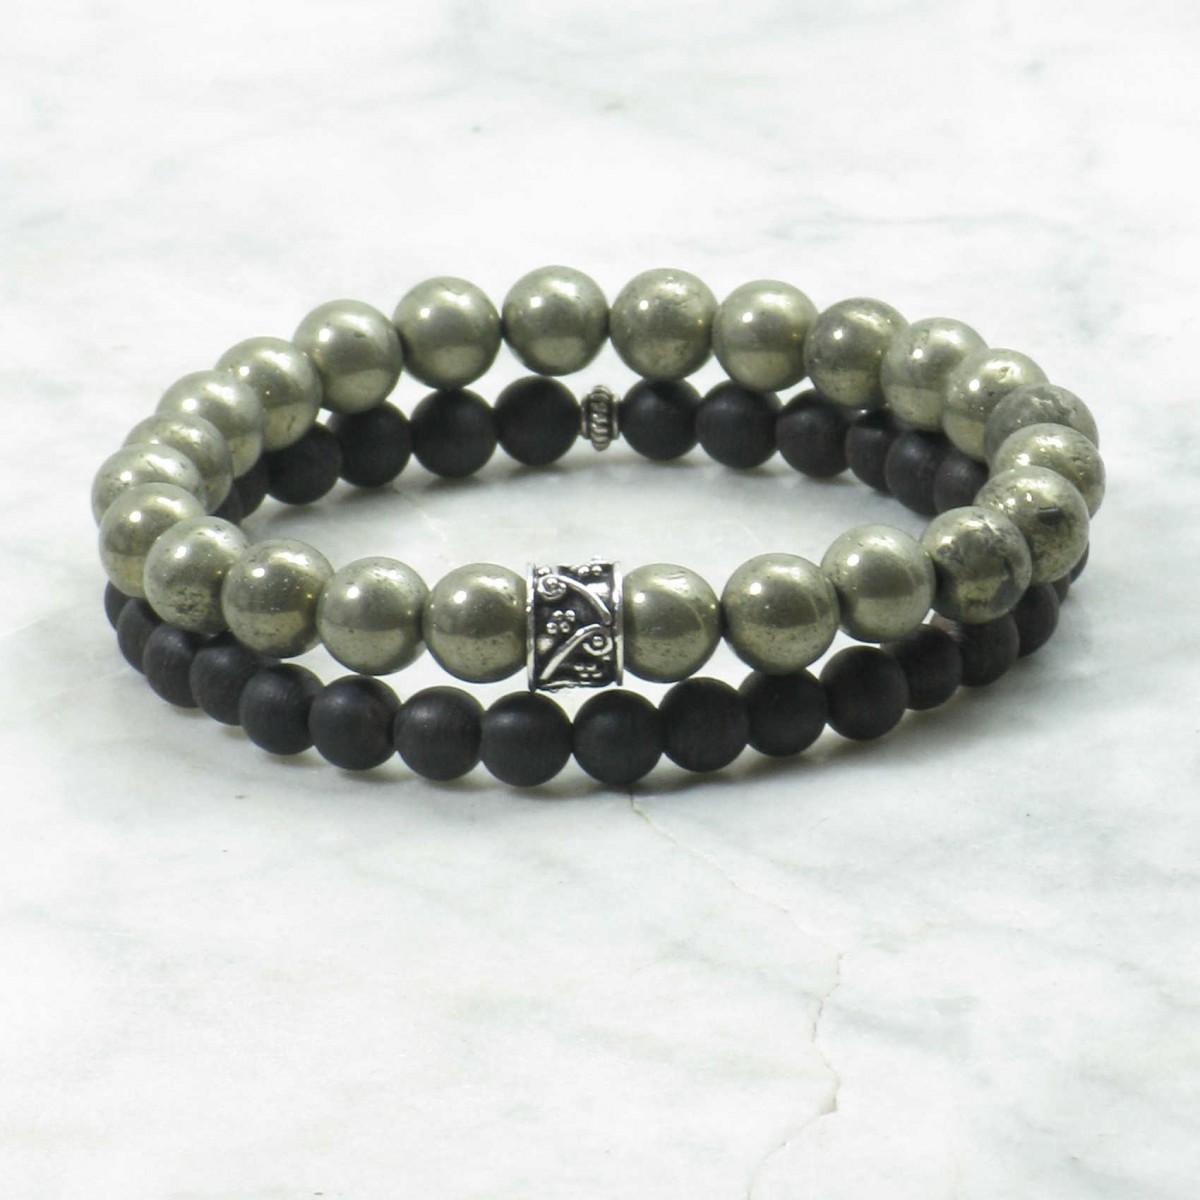 Shreyas_Bracelets_for_Men_Mala_Beads_Stacks_Pyrite_Agarwood_Buddhist_Prayer_Beads